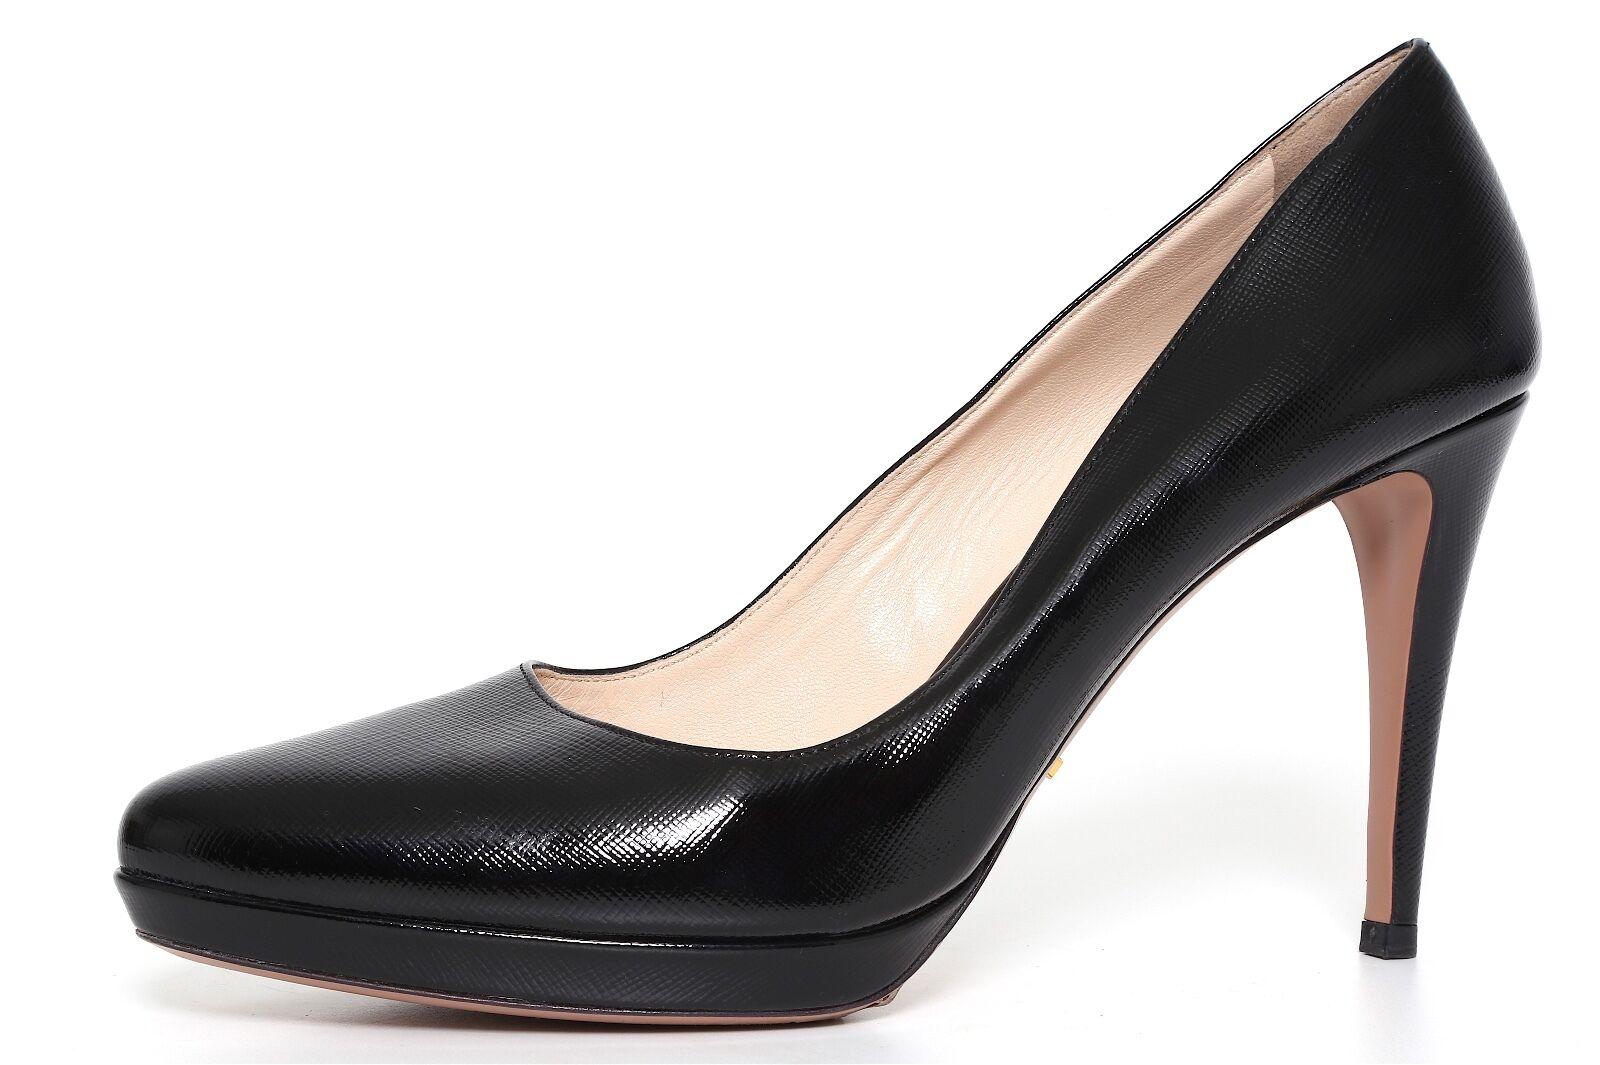 Prada High Heel Pumps Leather Black Women Size 40.5 EUR 4091